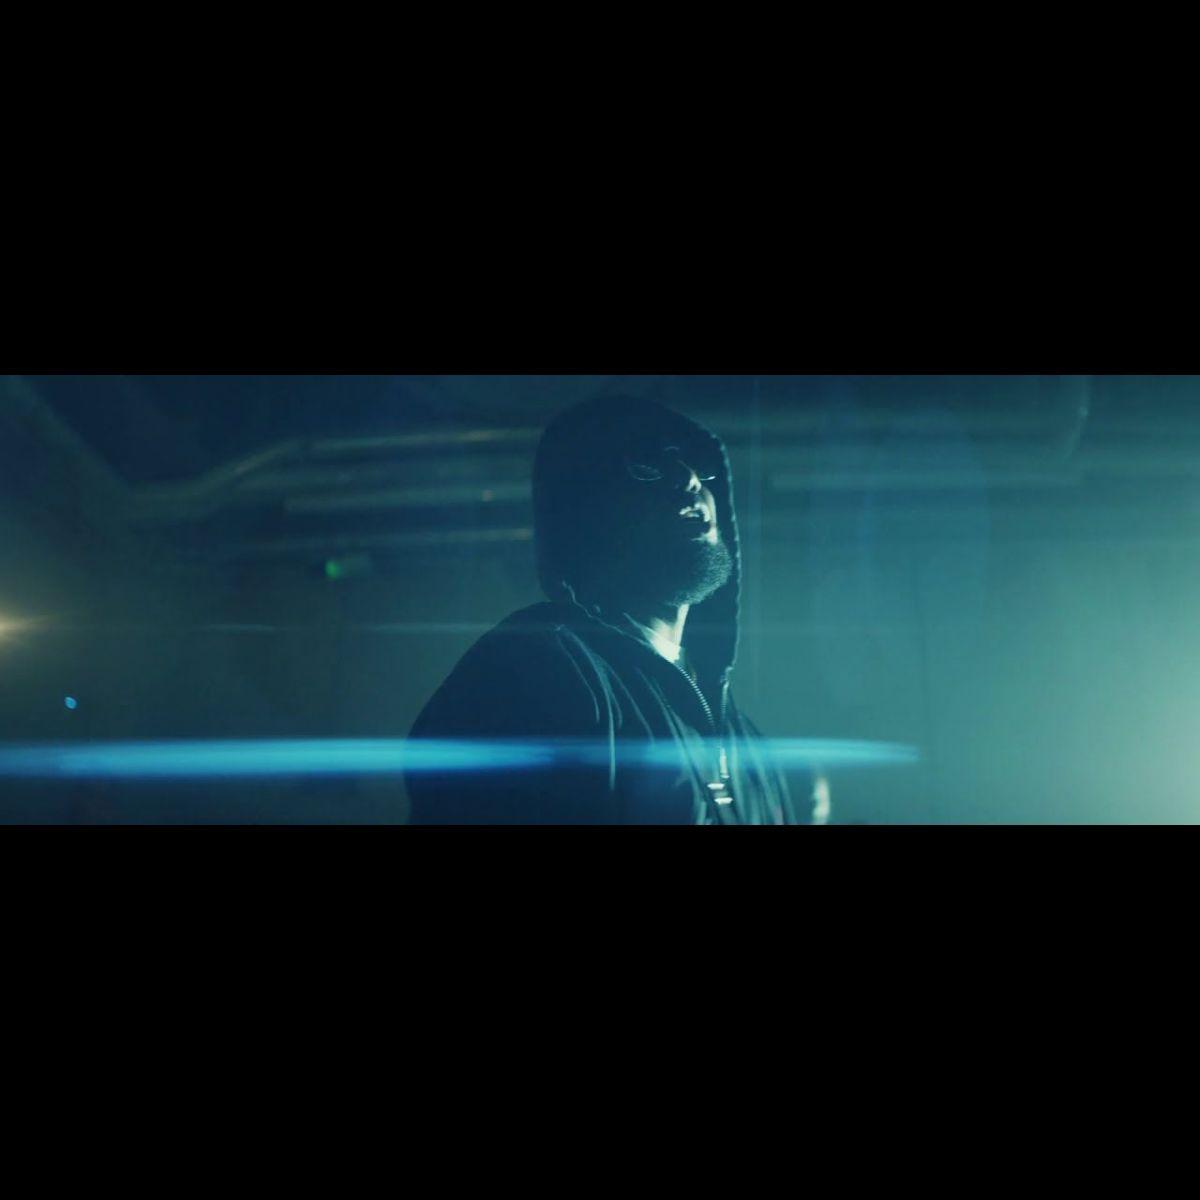 Headie One - Only You Freestyle (ft. Drake) (Thumbnail)